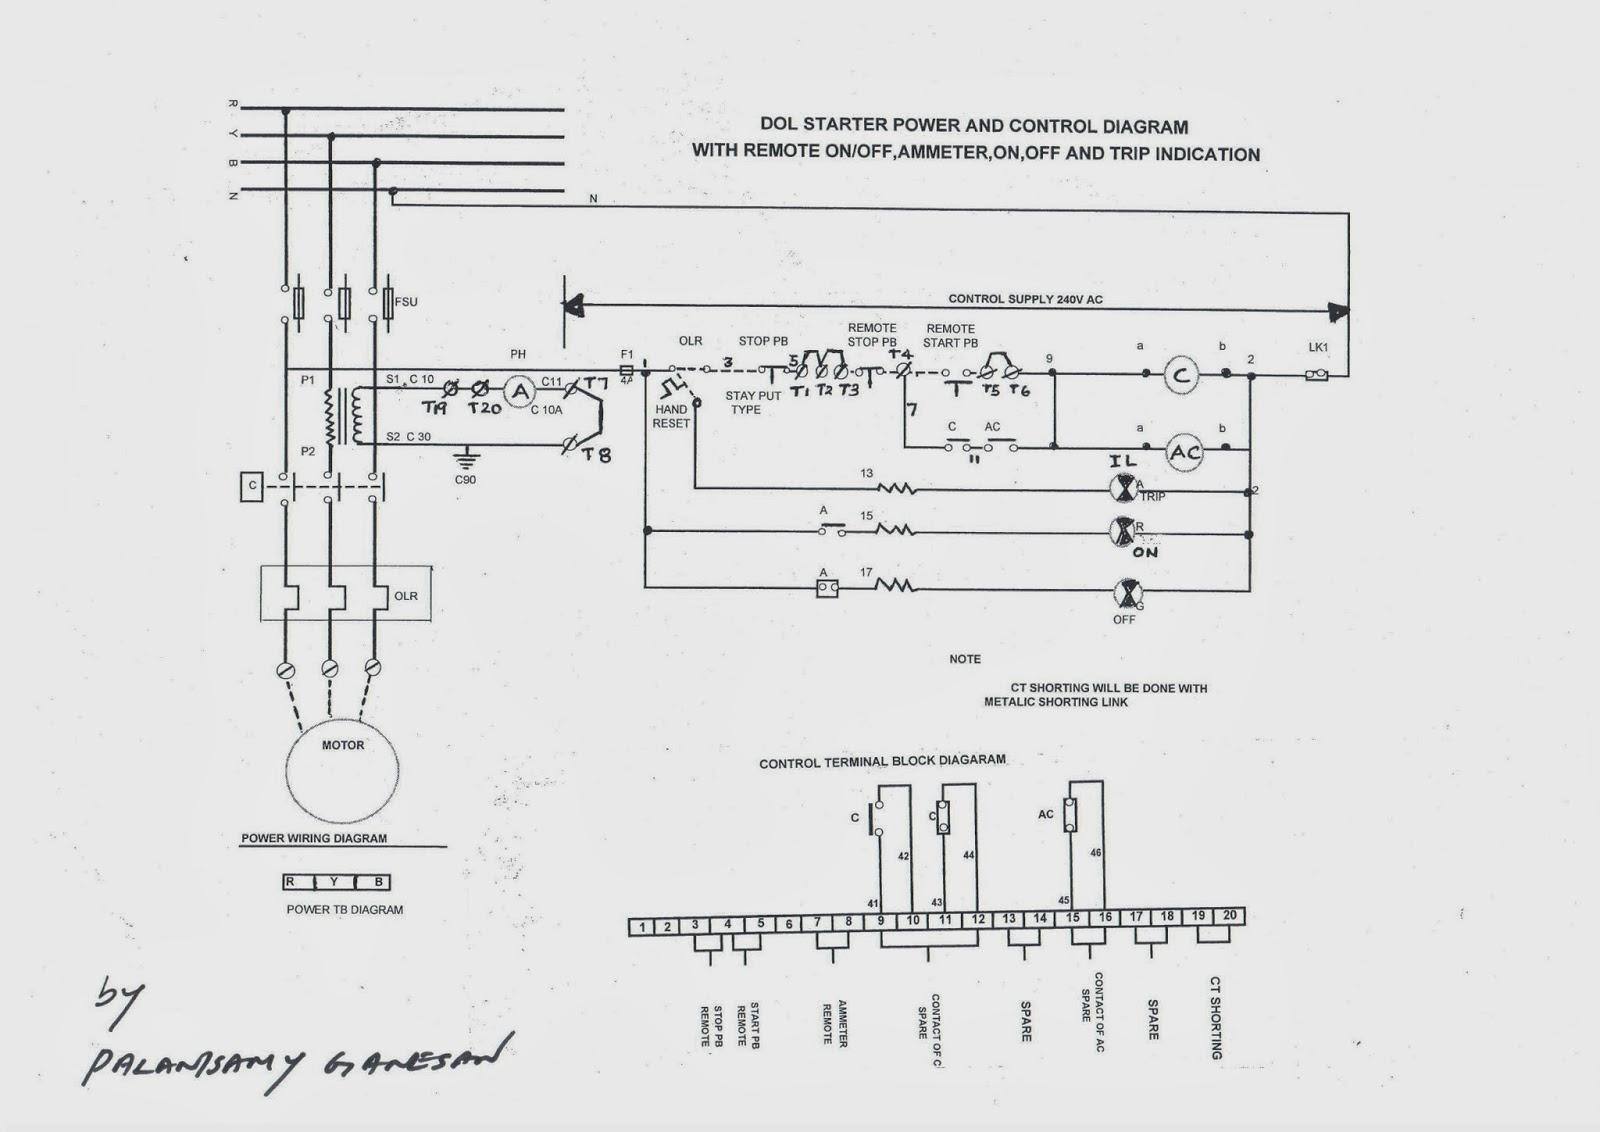 control wiring diagram of dol starter [ 1600 x 1132 Pixel ]